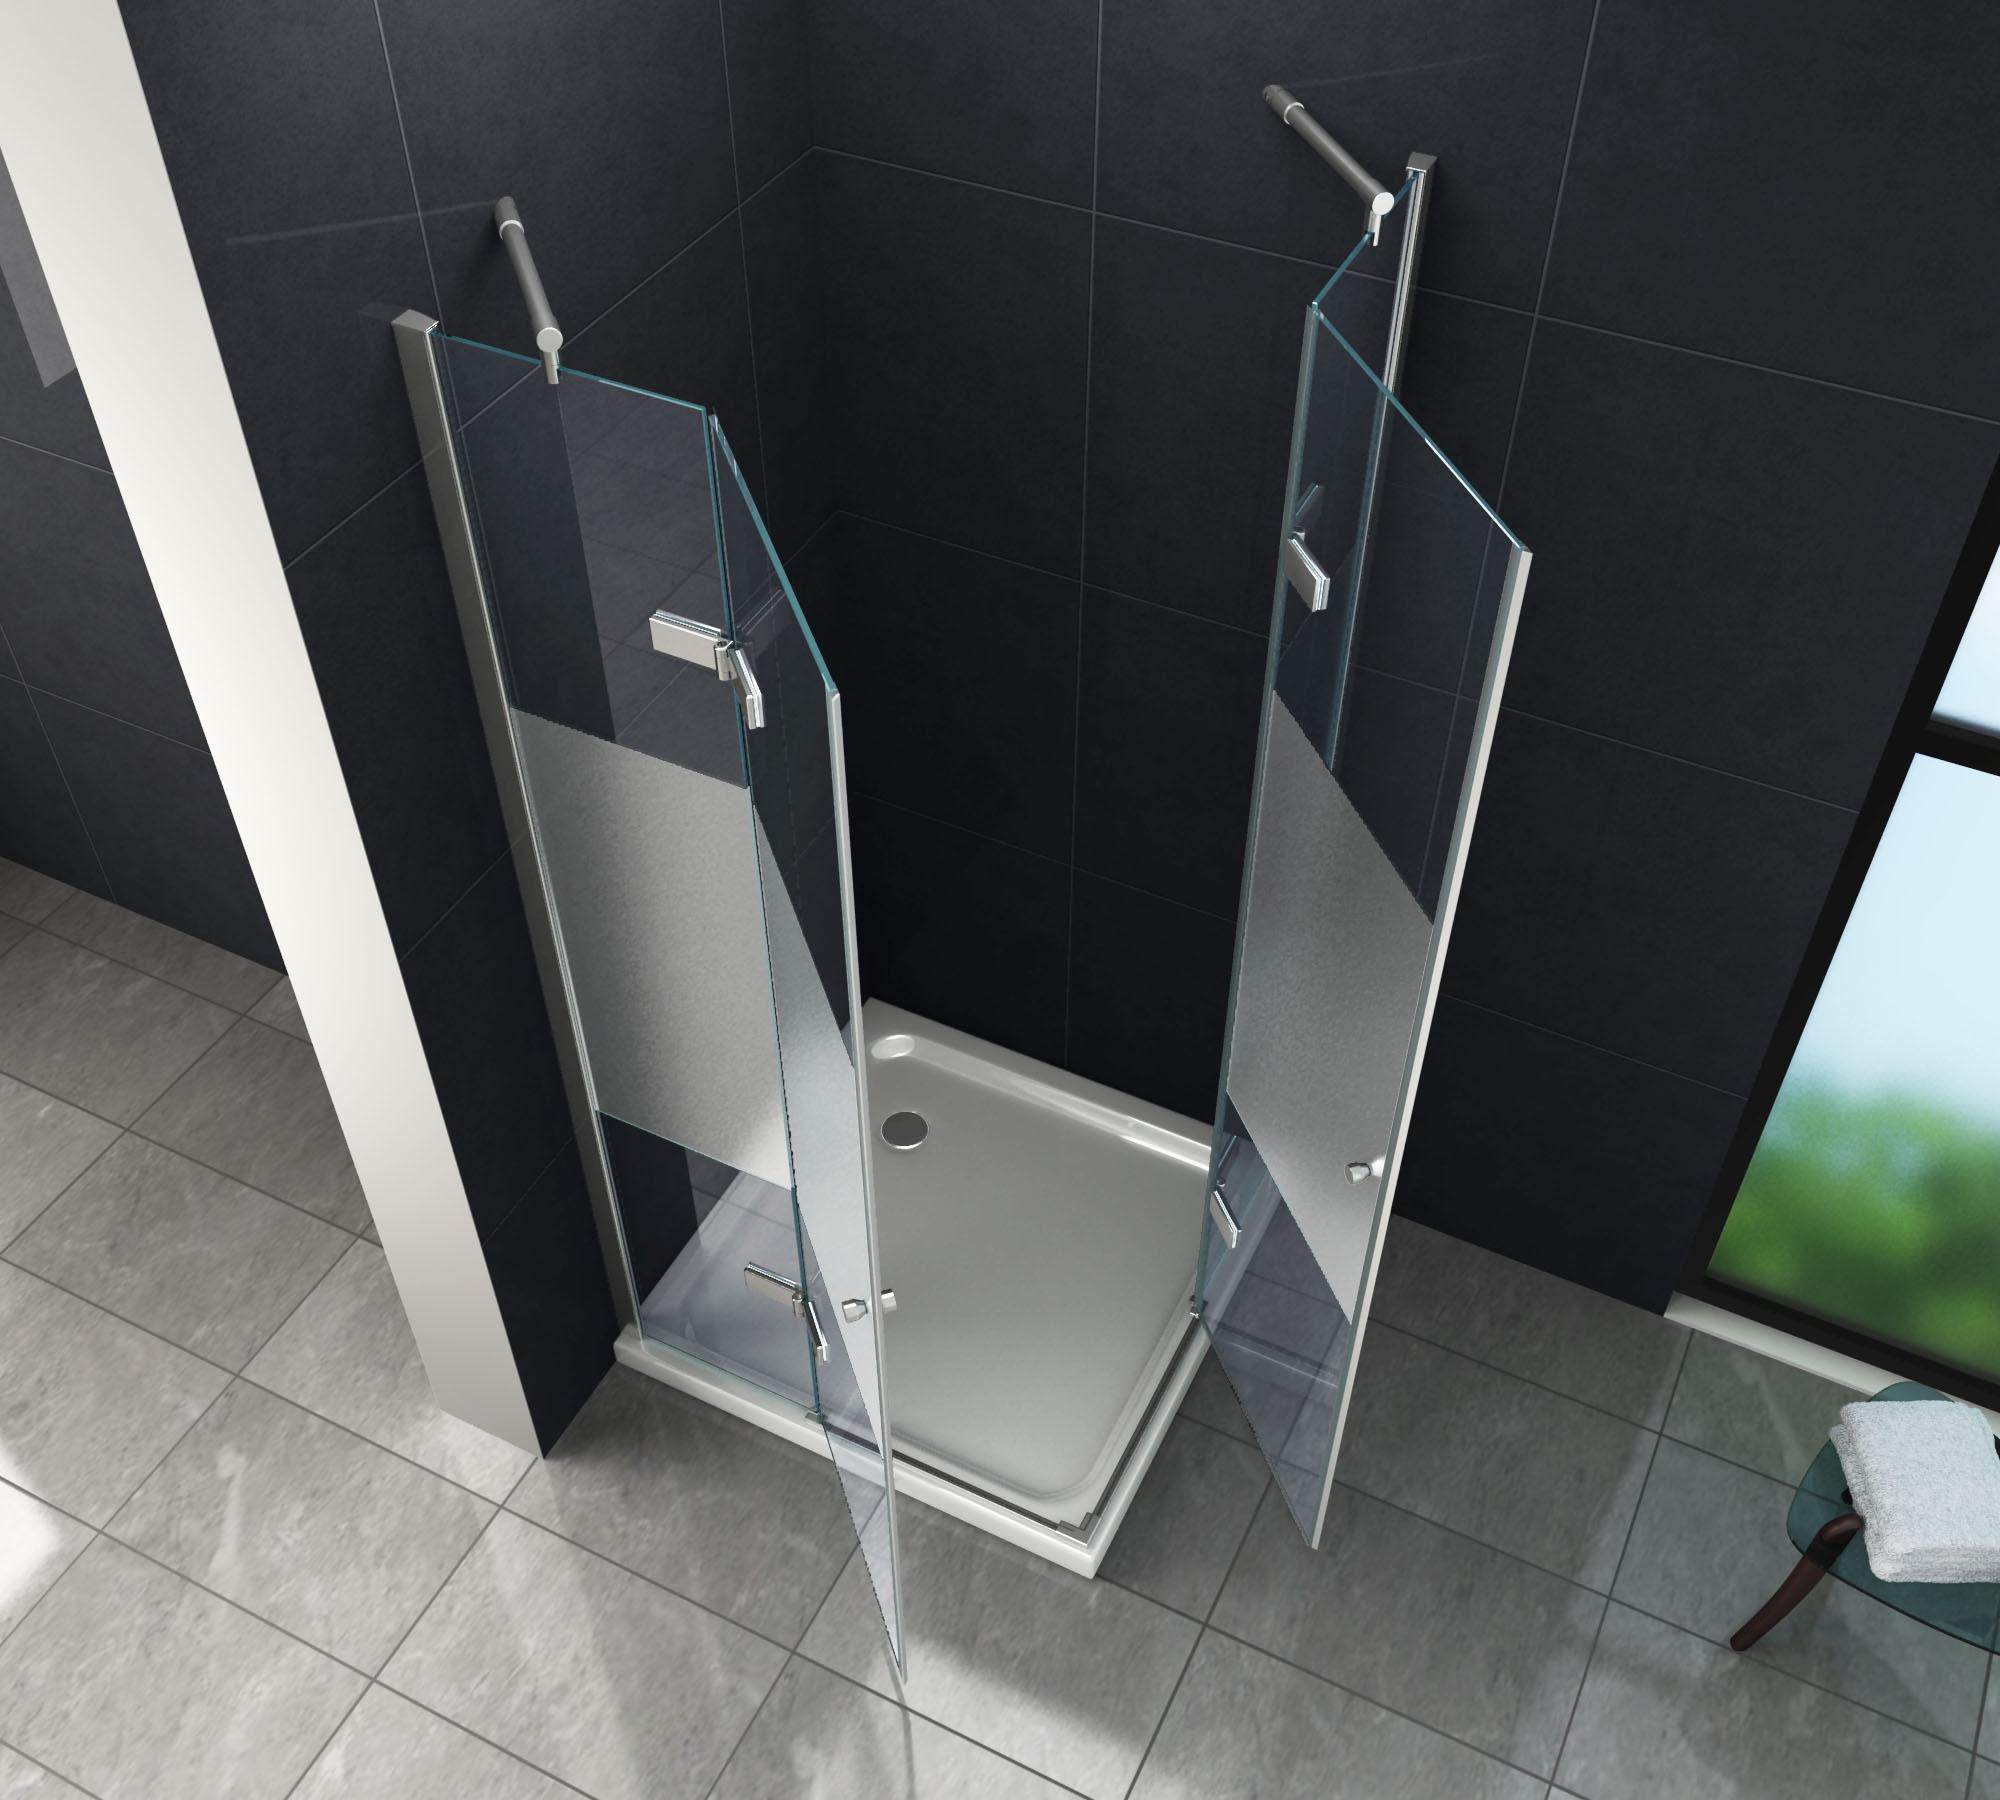 duschkabine corno cover 90 x 90 x 195 cm ohne duschtasse glasdeals. Black Bedroom Furniture Sets. Home Design Ideas